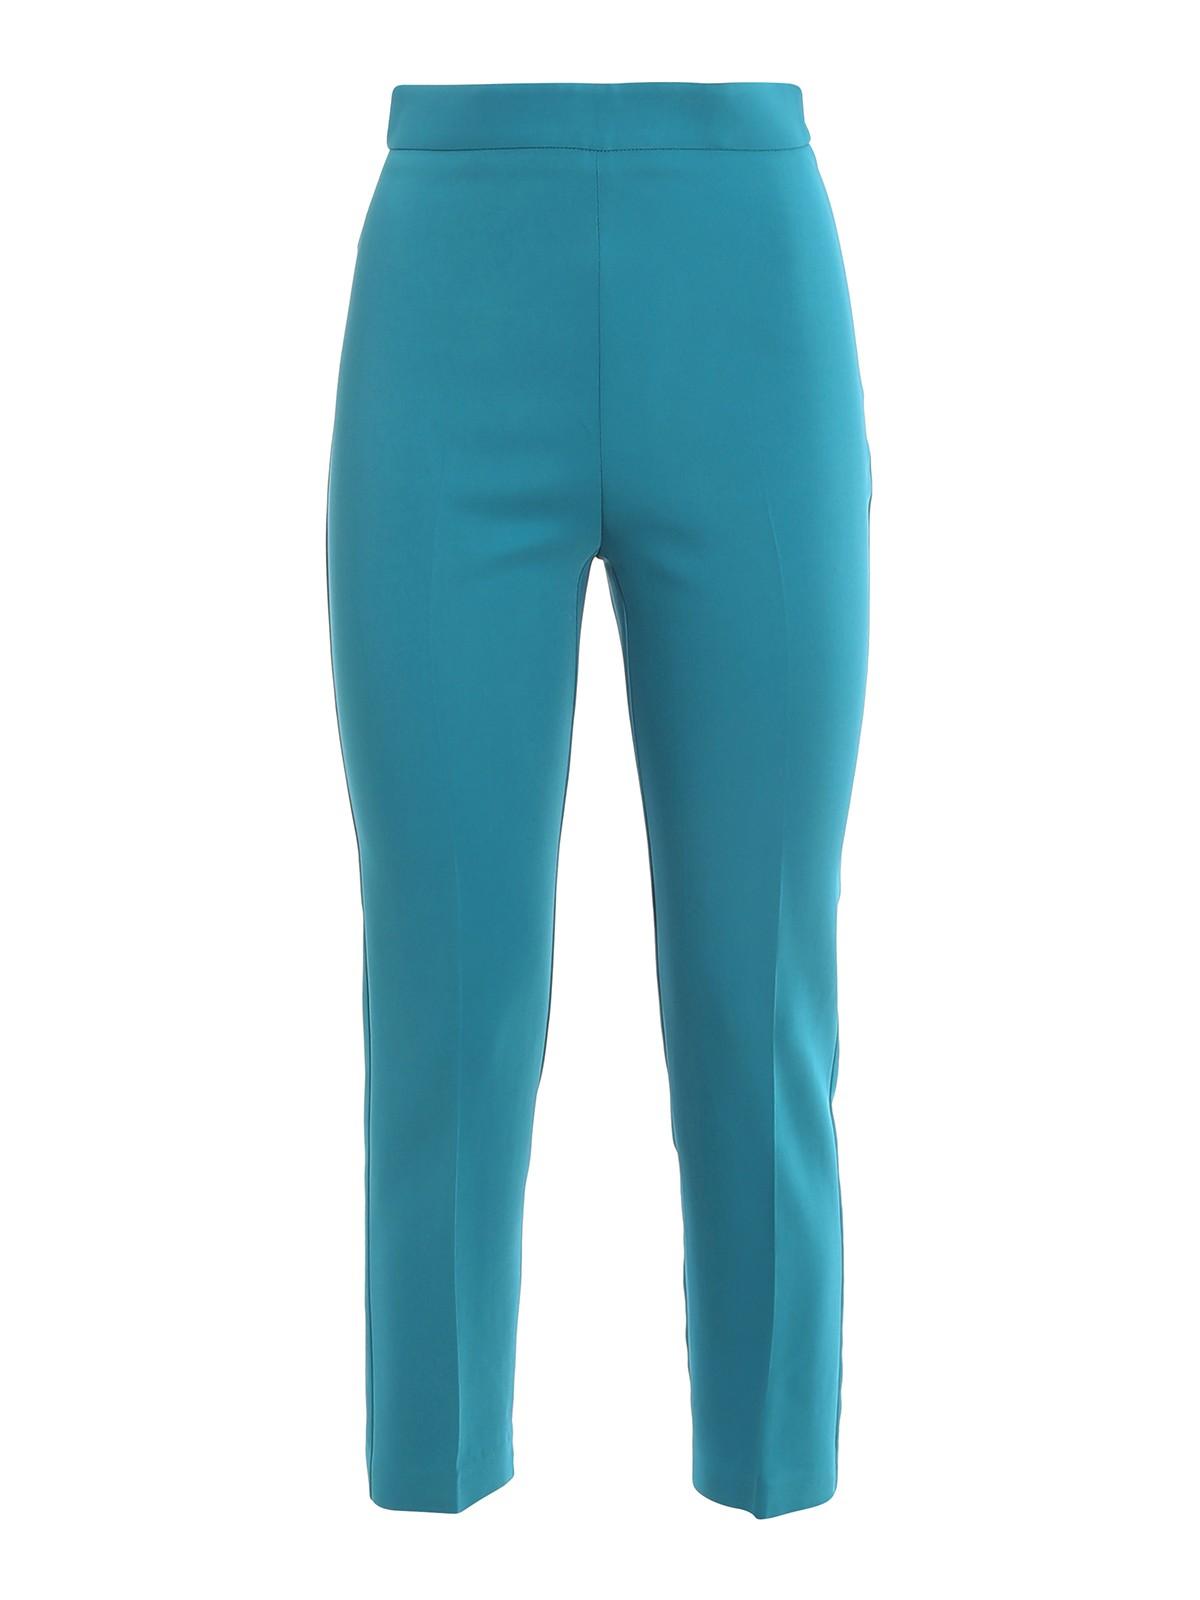 Pinko Bea 6 Pants In Light Blue